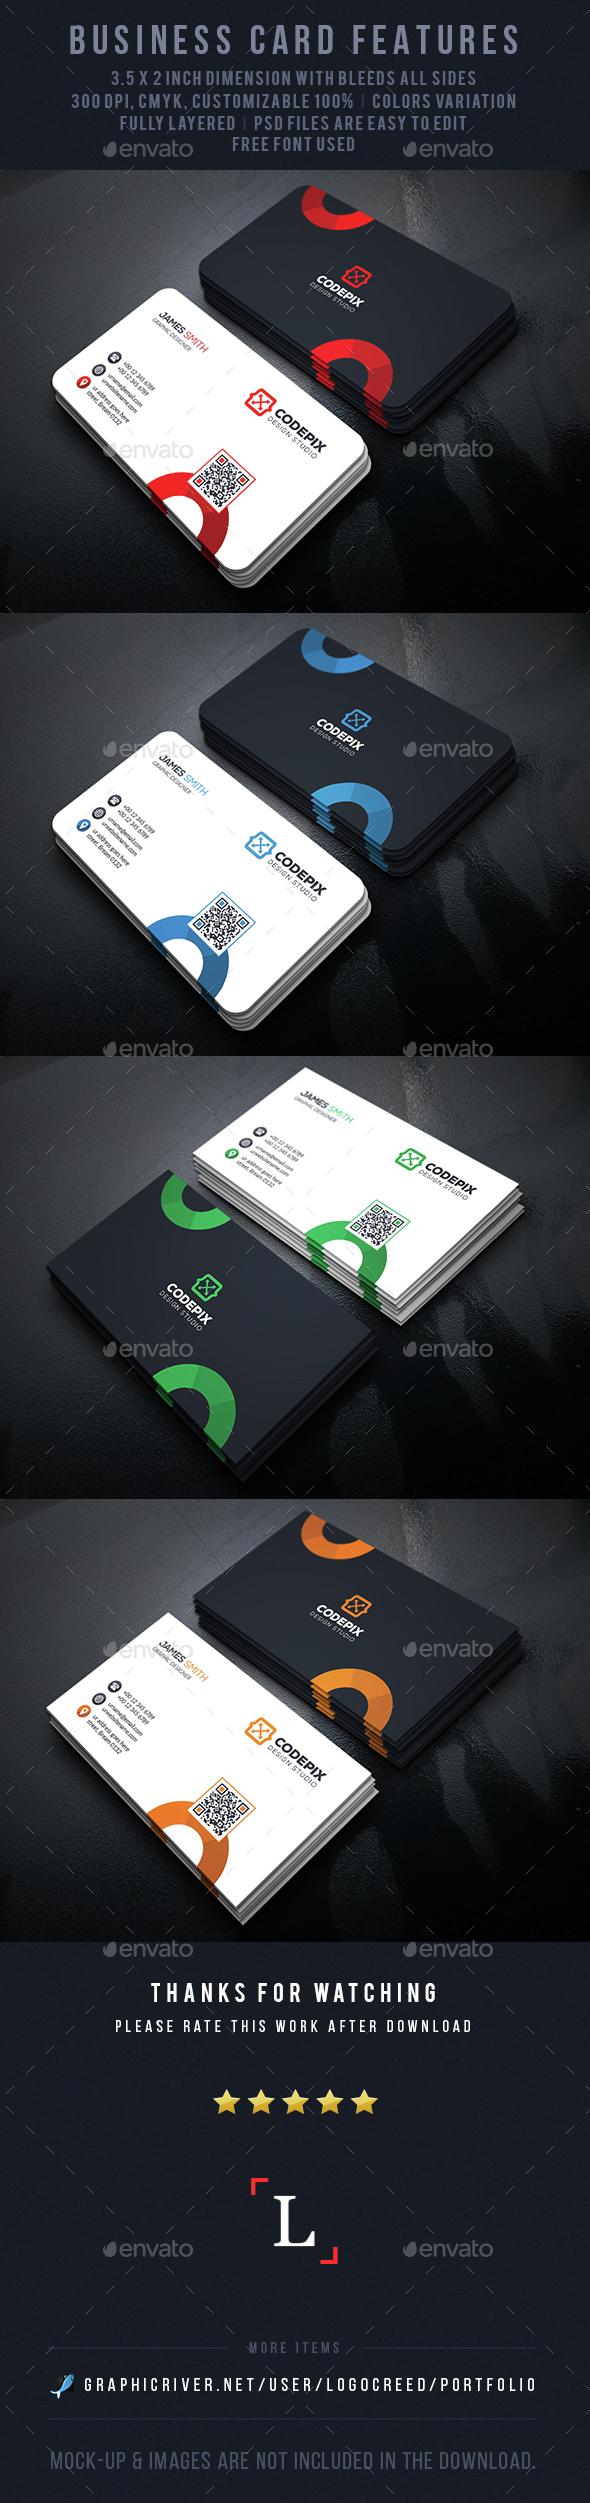 Circles Business Card - Business Cards Print Templates